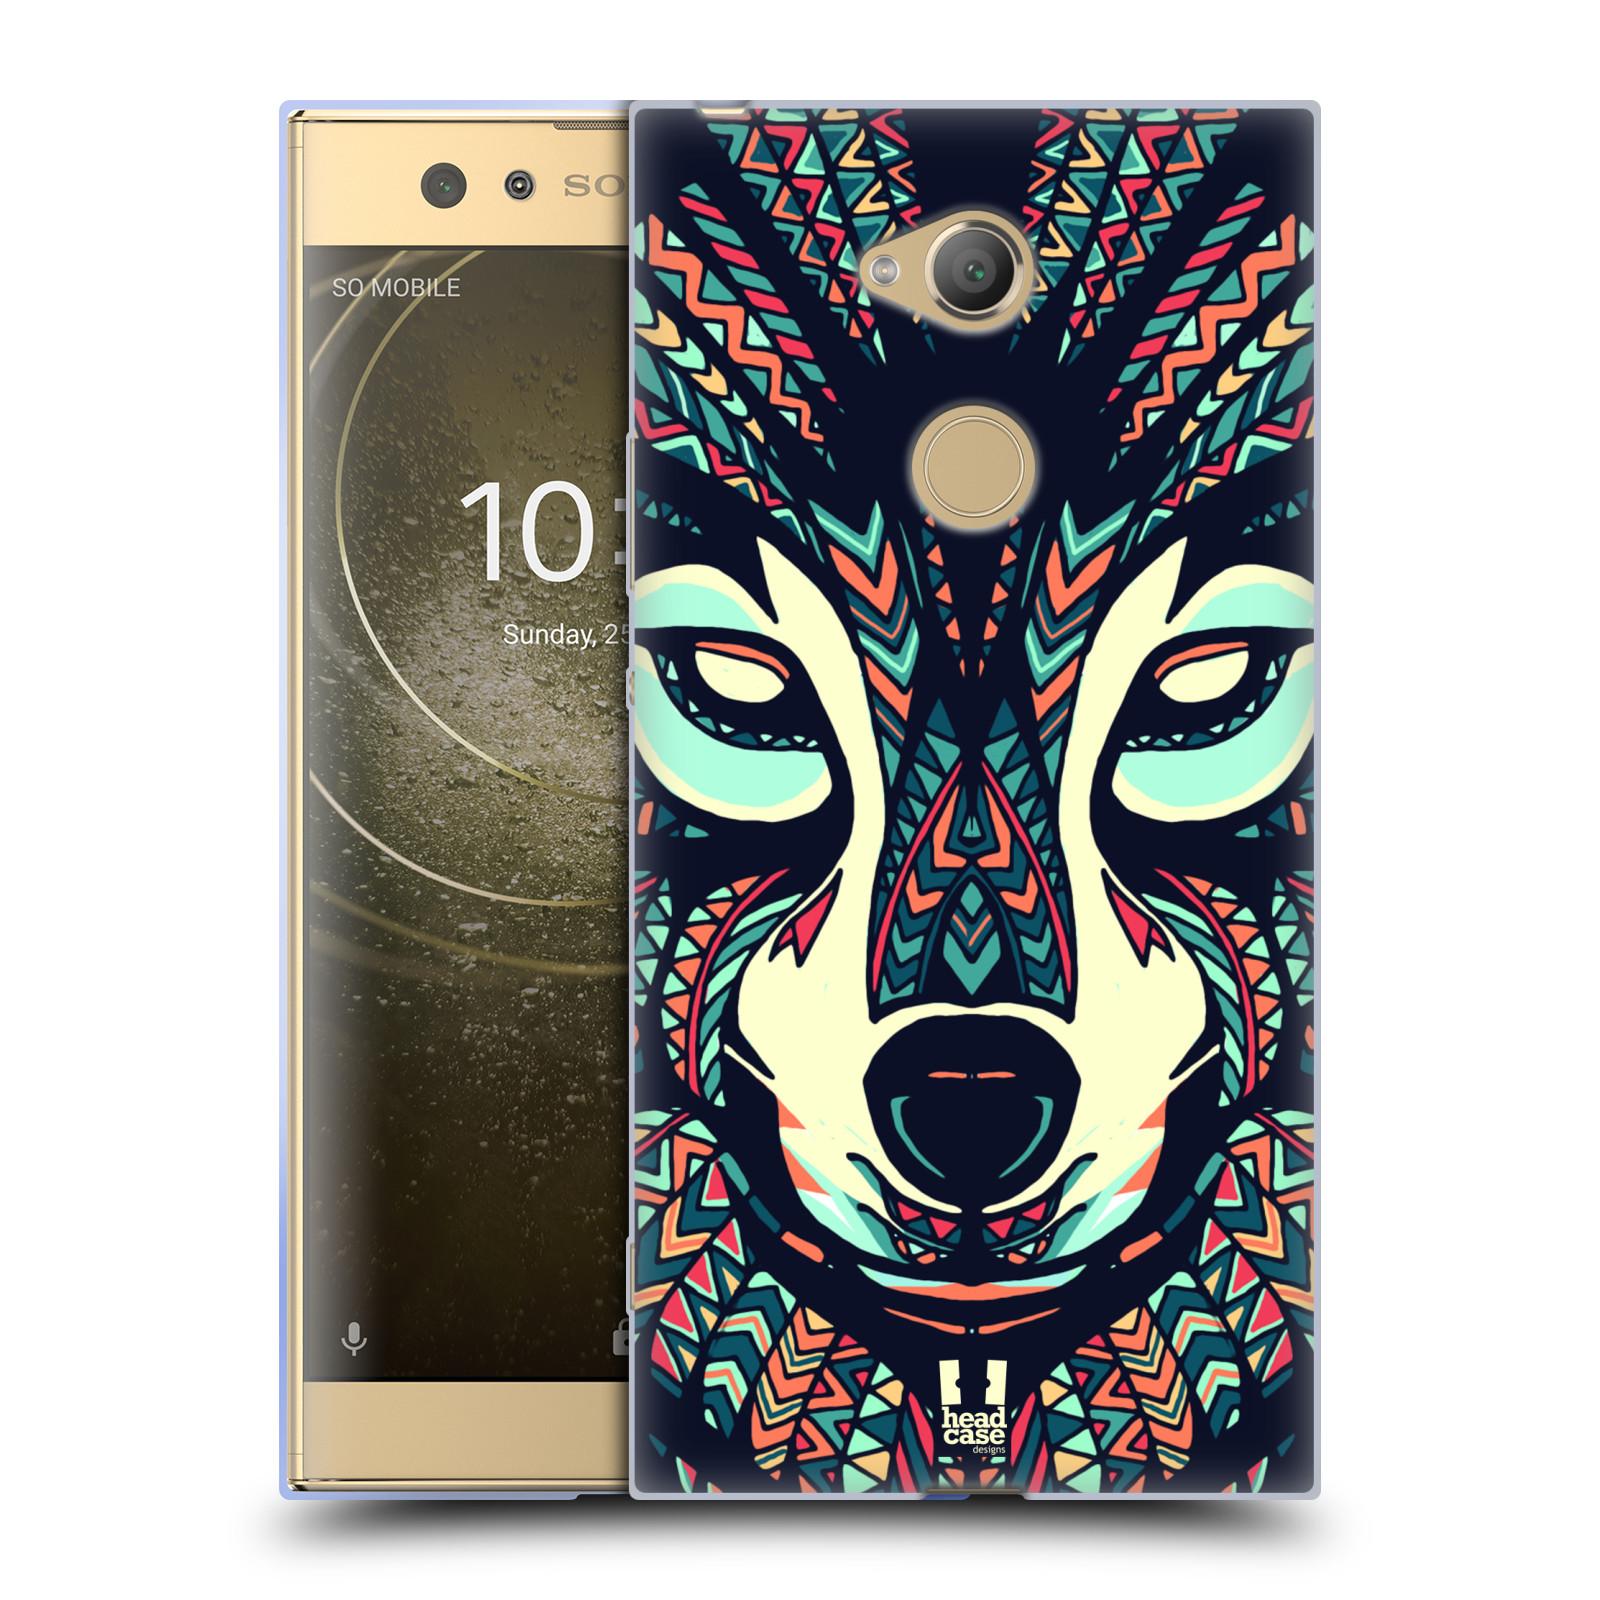 Silikonové pouzdro na mobil Sony Xperia XA2 Ultra - Head Case - AZTEC VLK